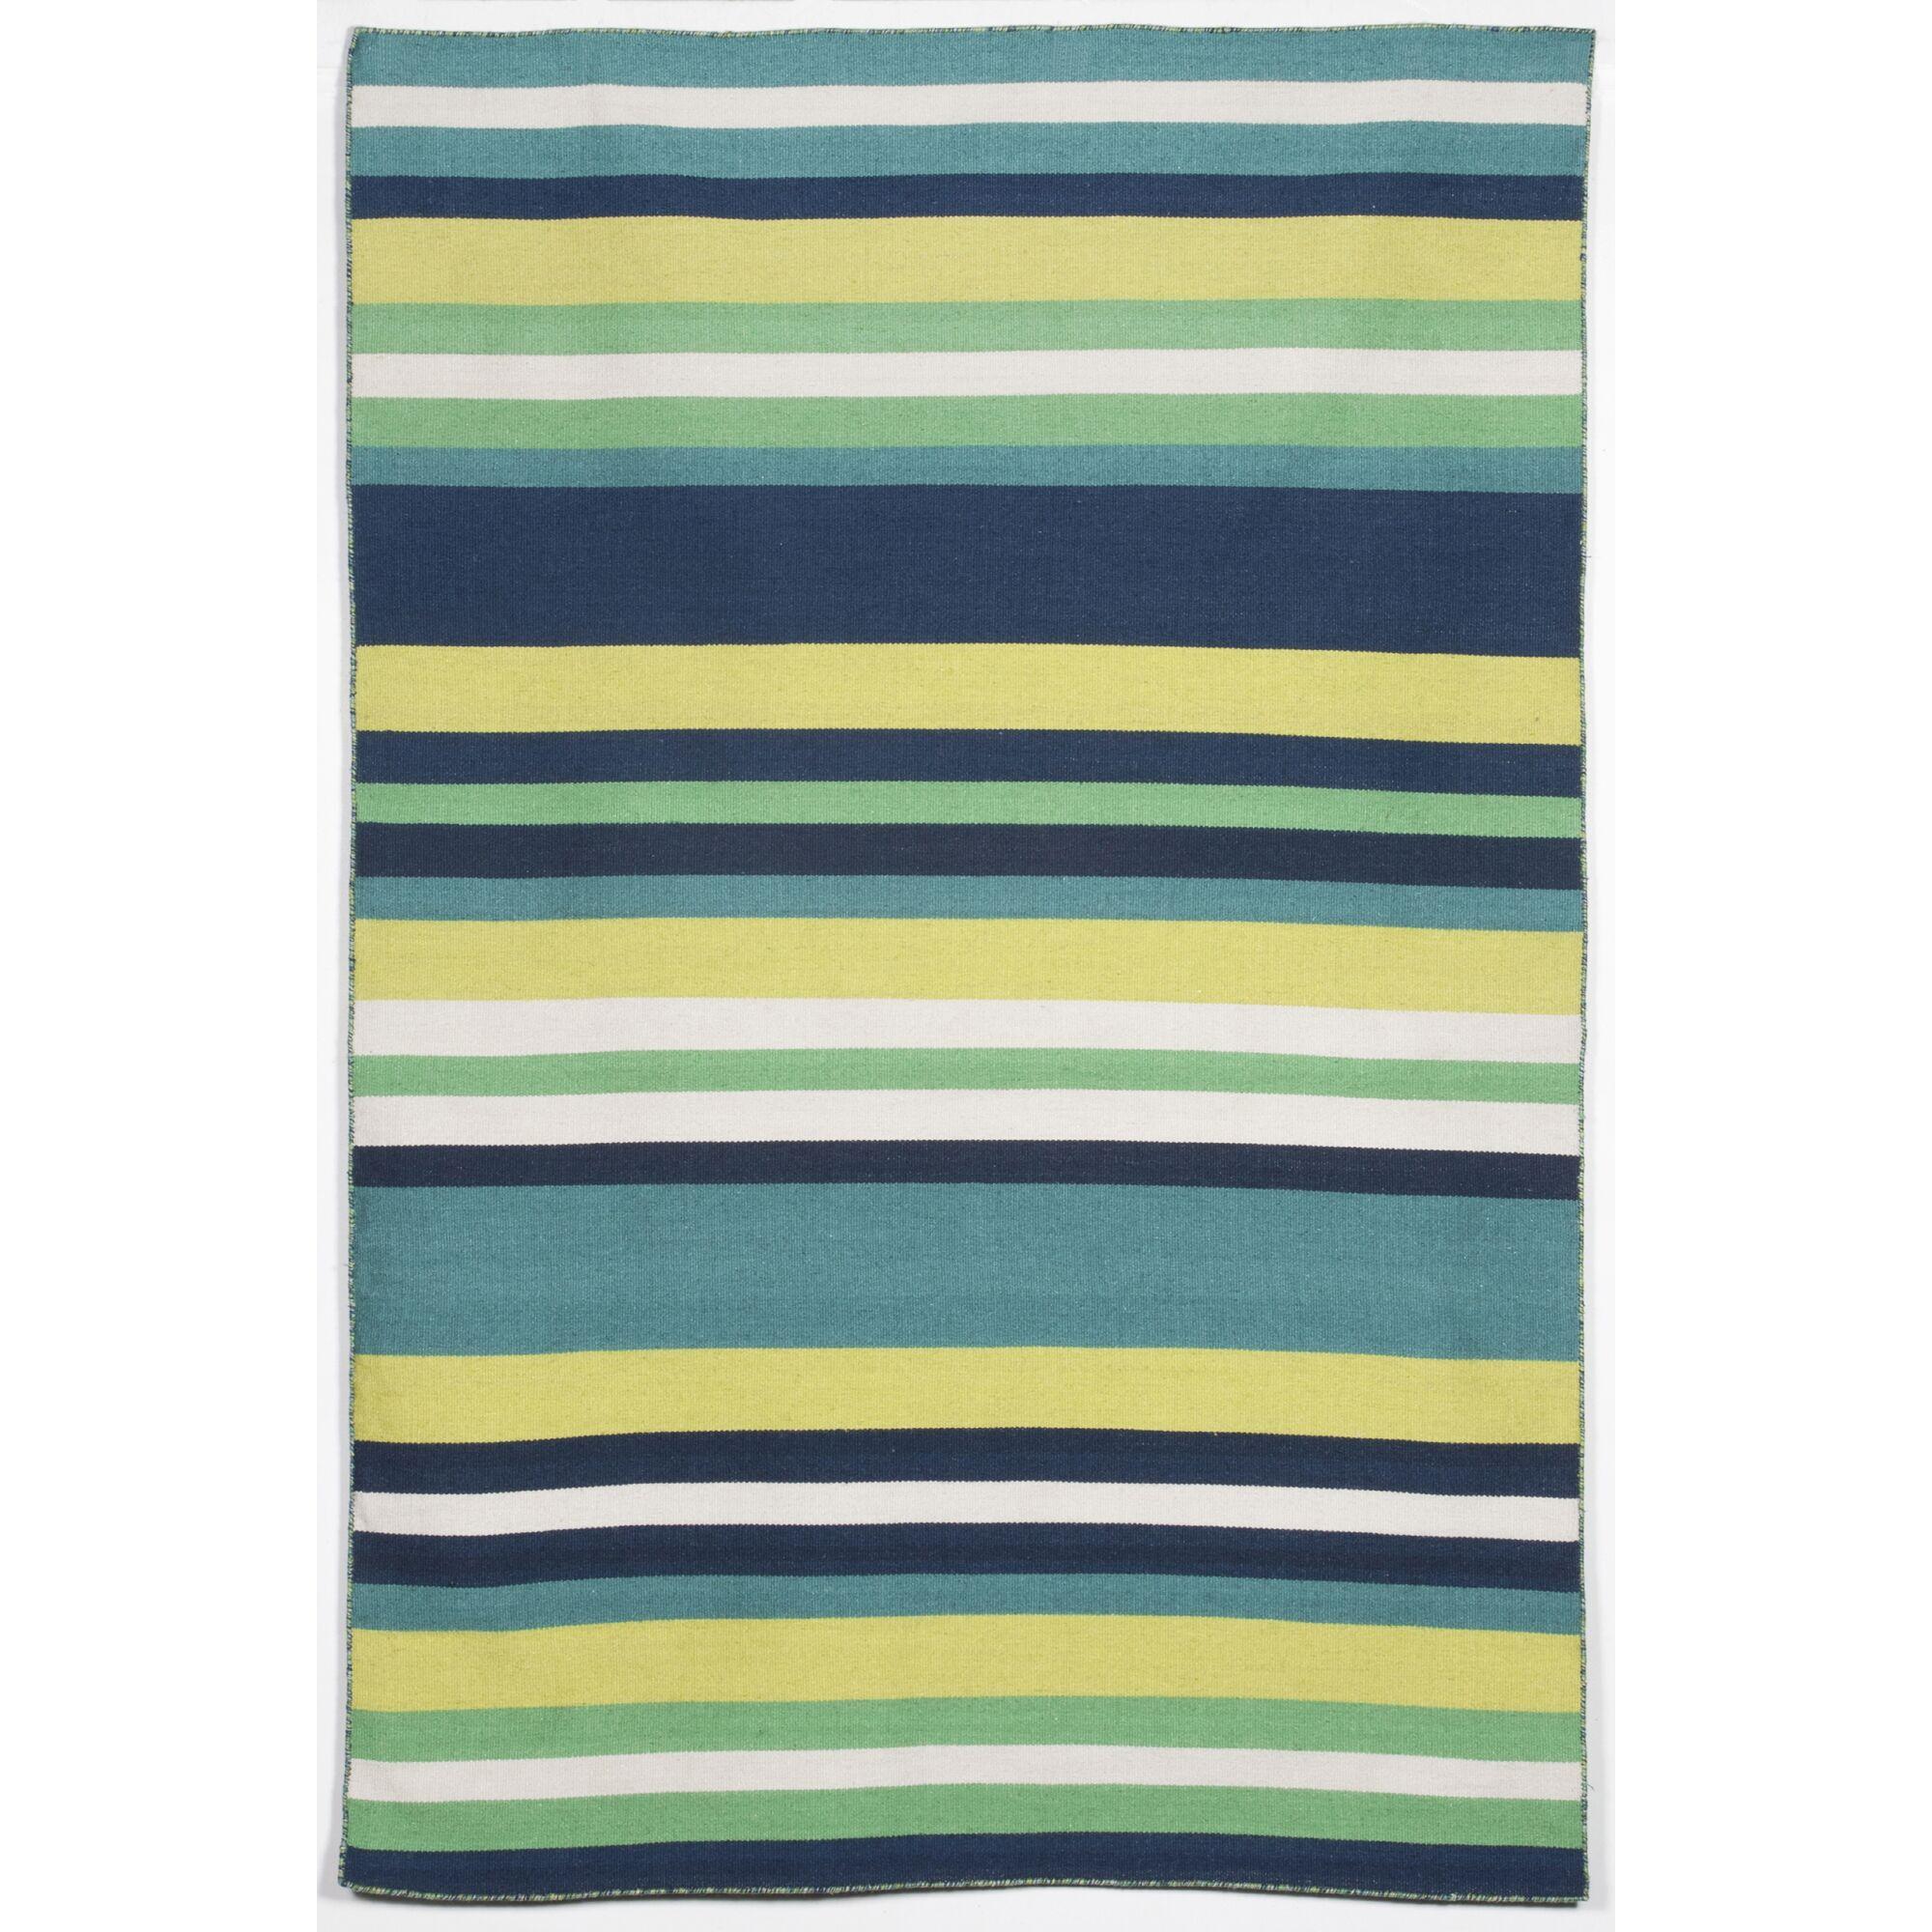 Ranier Hand-Woven Green Indoor/Outdoor Area Rug Rug Size: Rectangle 8'3